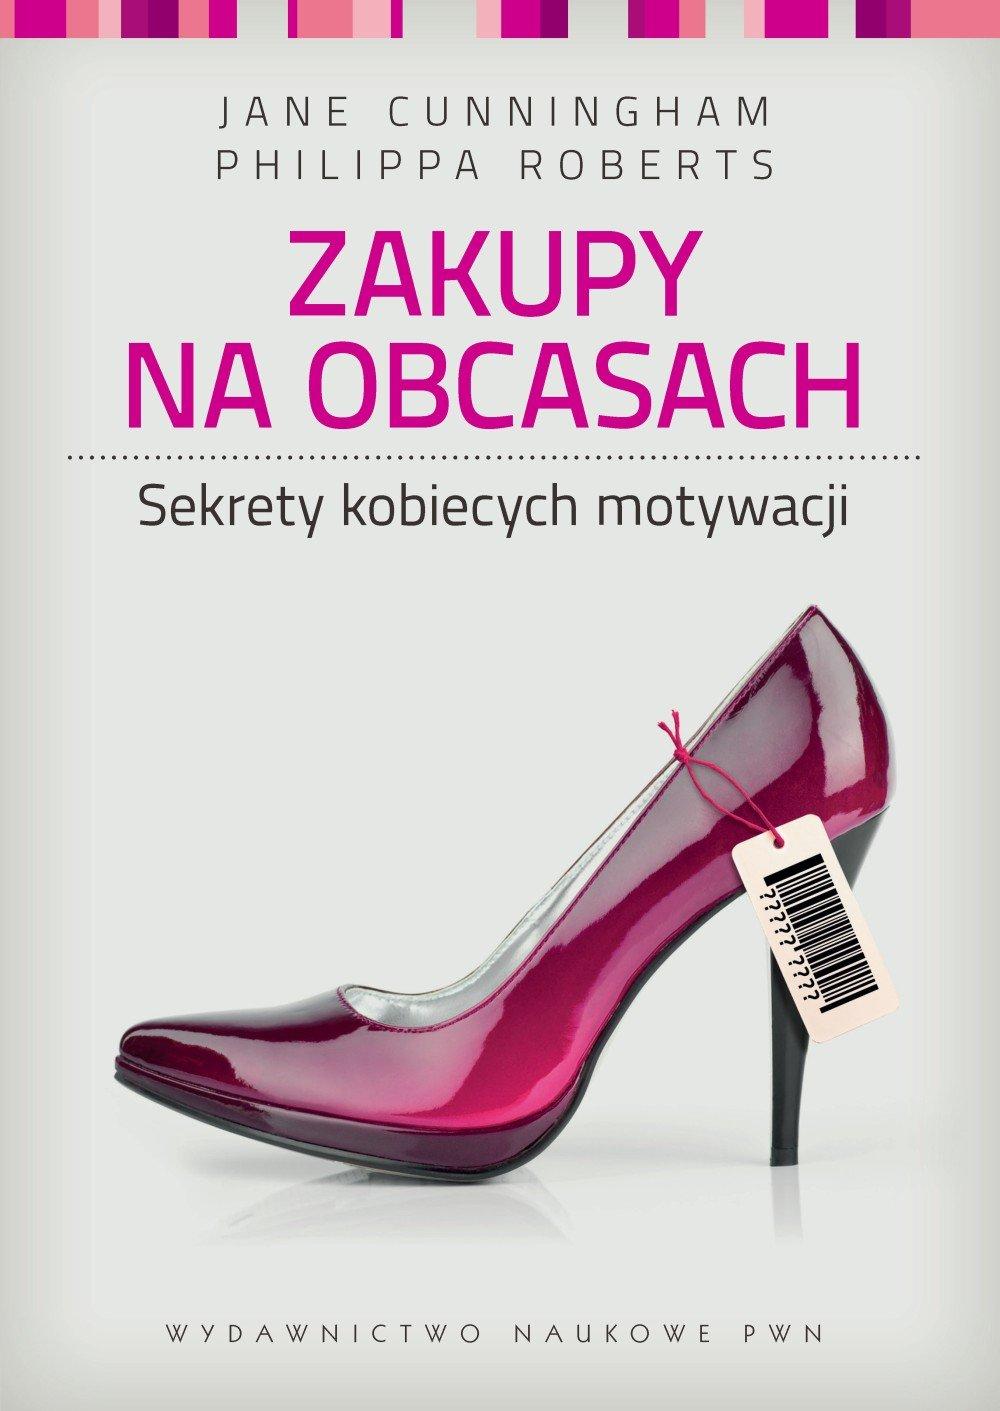 Zakupy na obcasach - Ebook (Książka na Kindle) do pobrania w formacie MOBI